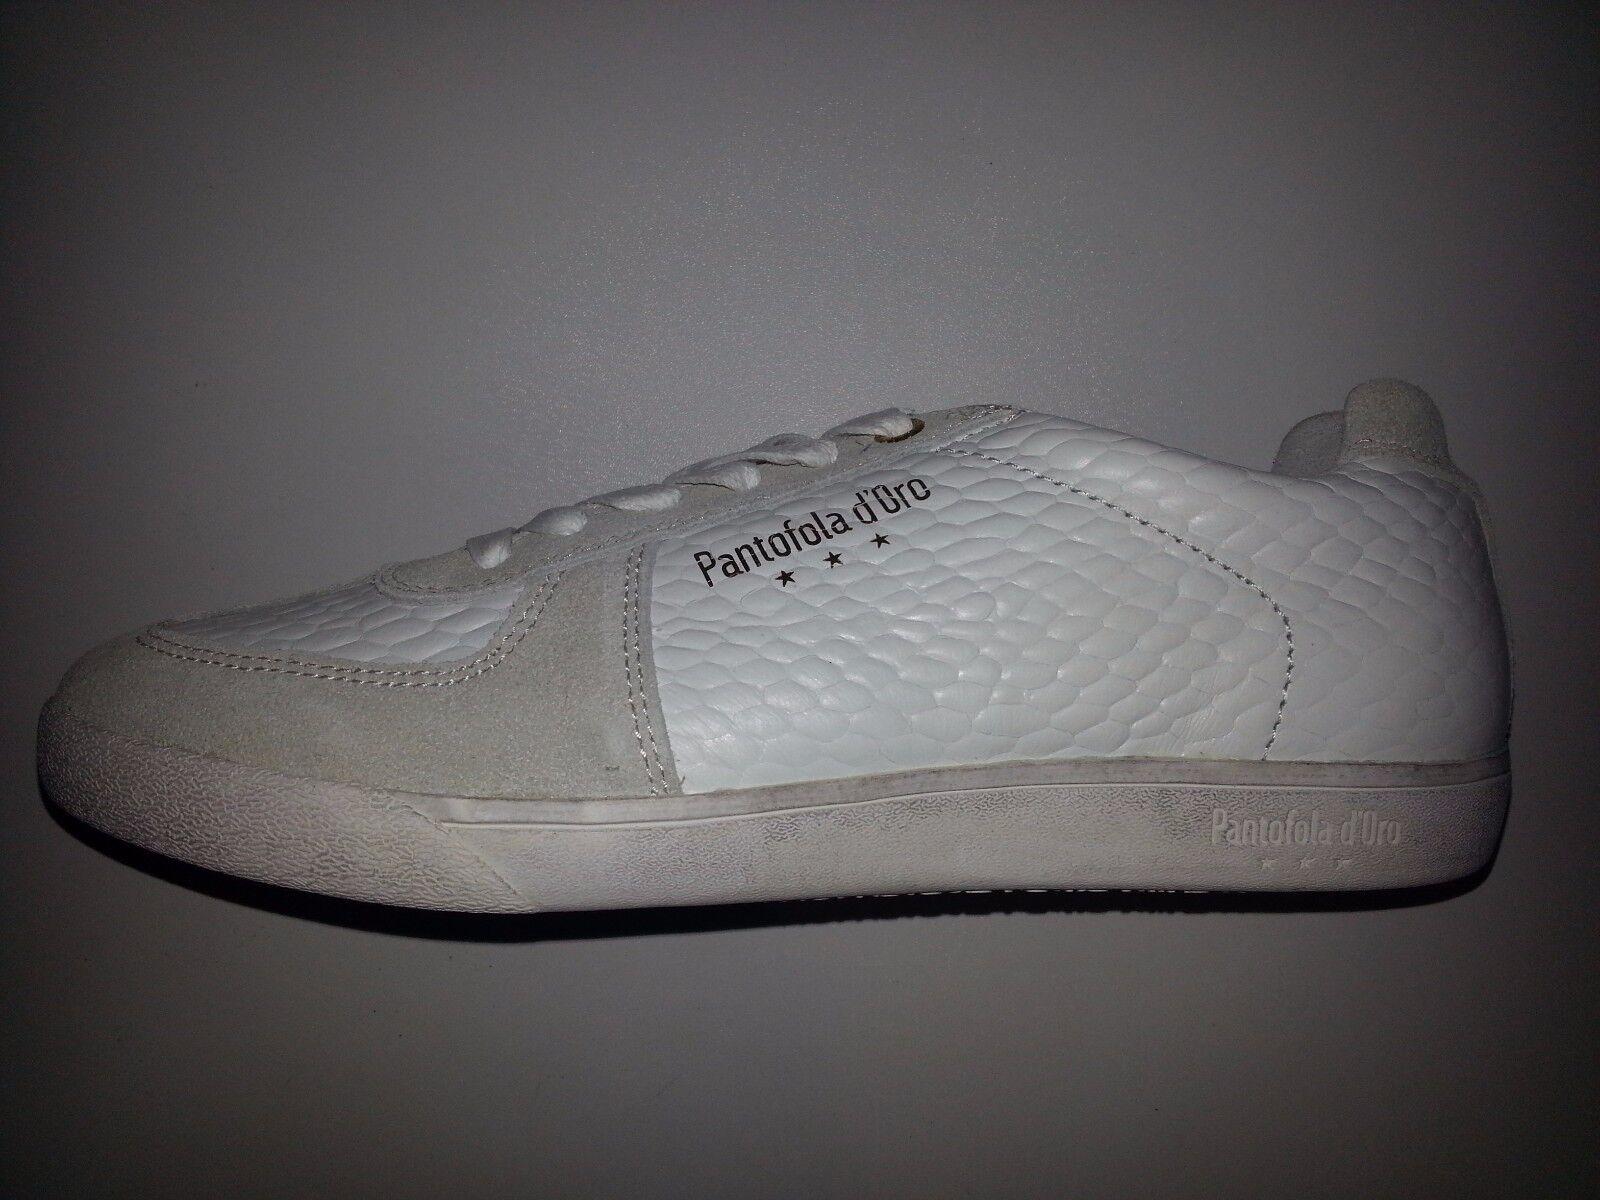 Pantofola Sneaker dOro Carrara Herren Leder Sneaker Pantofola weiß Größen 40-42-43-44-45-46 NEU 8b37f7